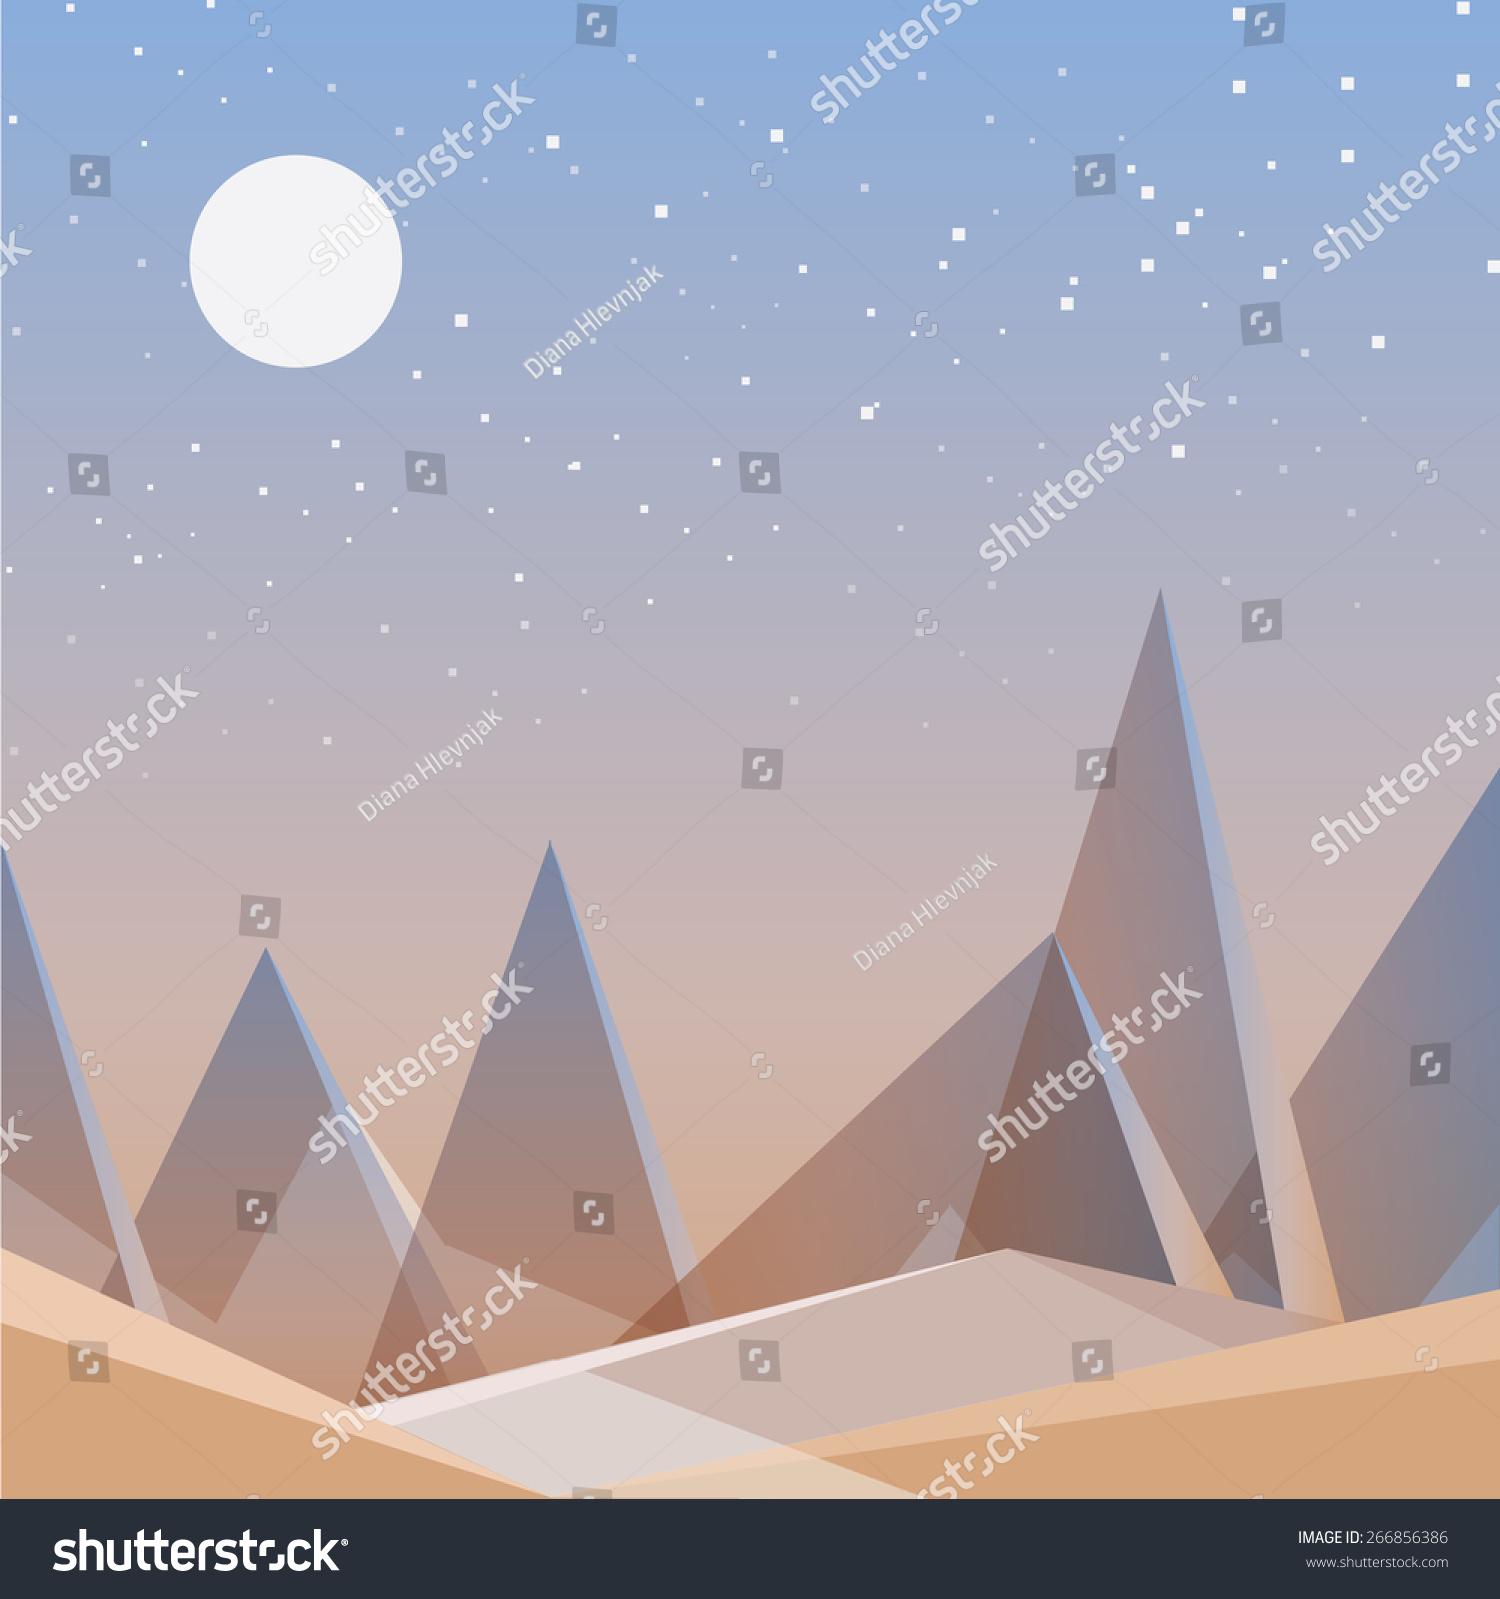 Abstract Desert Landscape Wallpaper Triangular Geometric